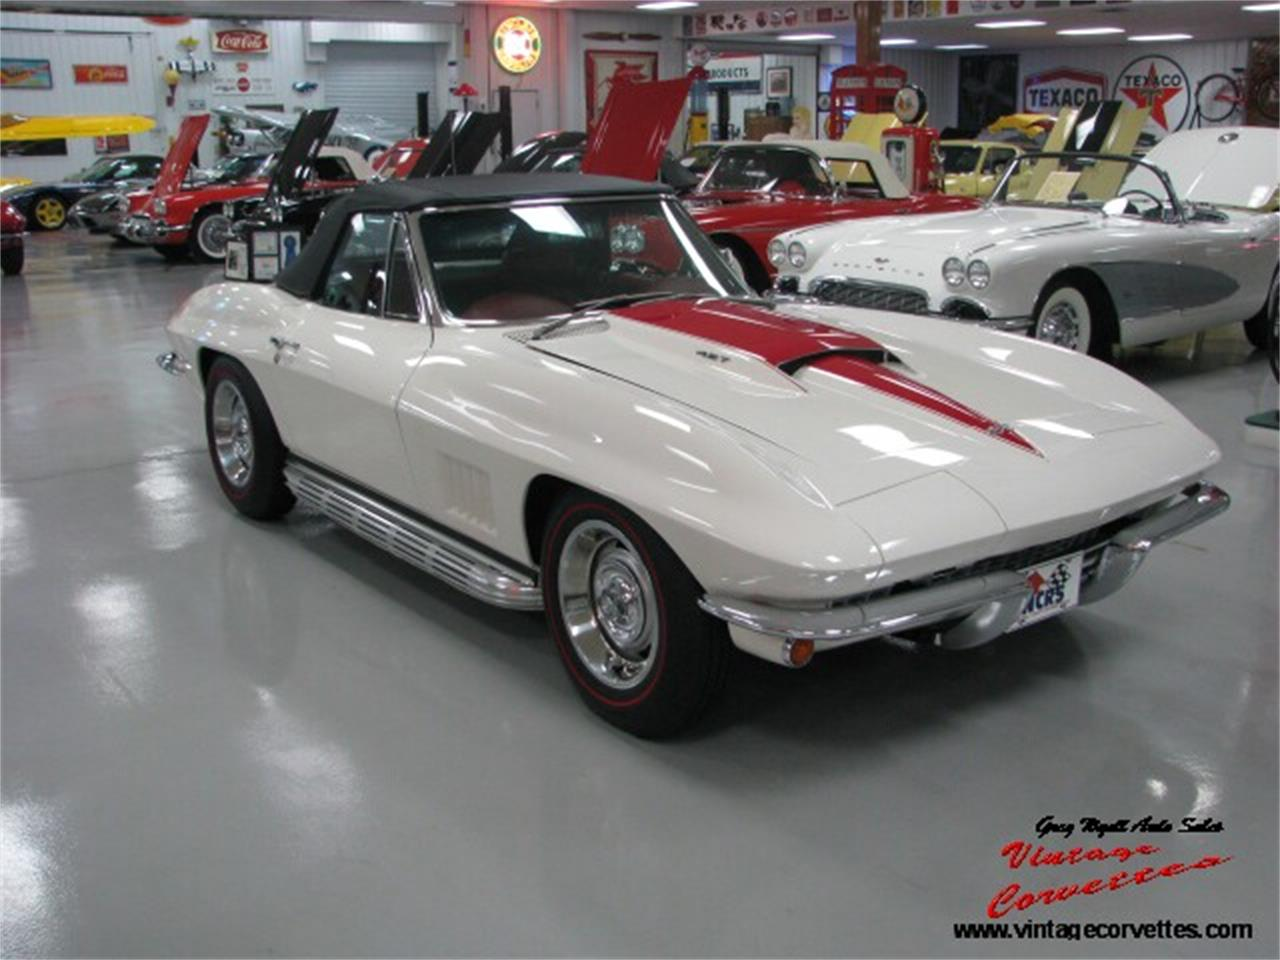 1967 Chevrolet Corvette (CC-1414780) for sale in Summerville, Georgia